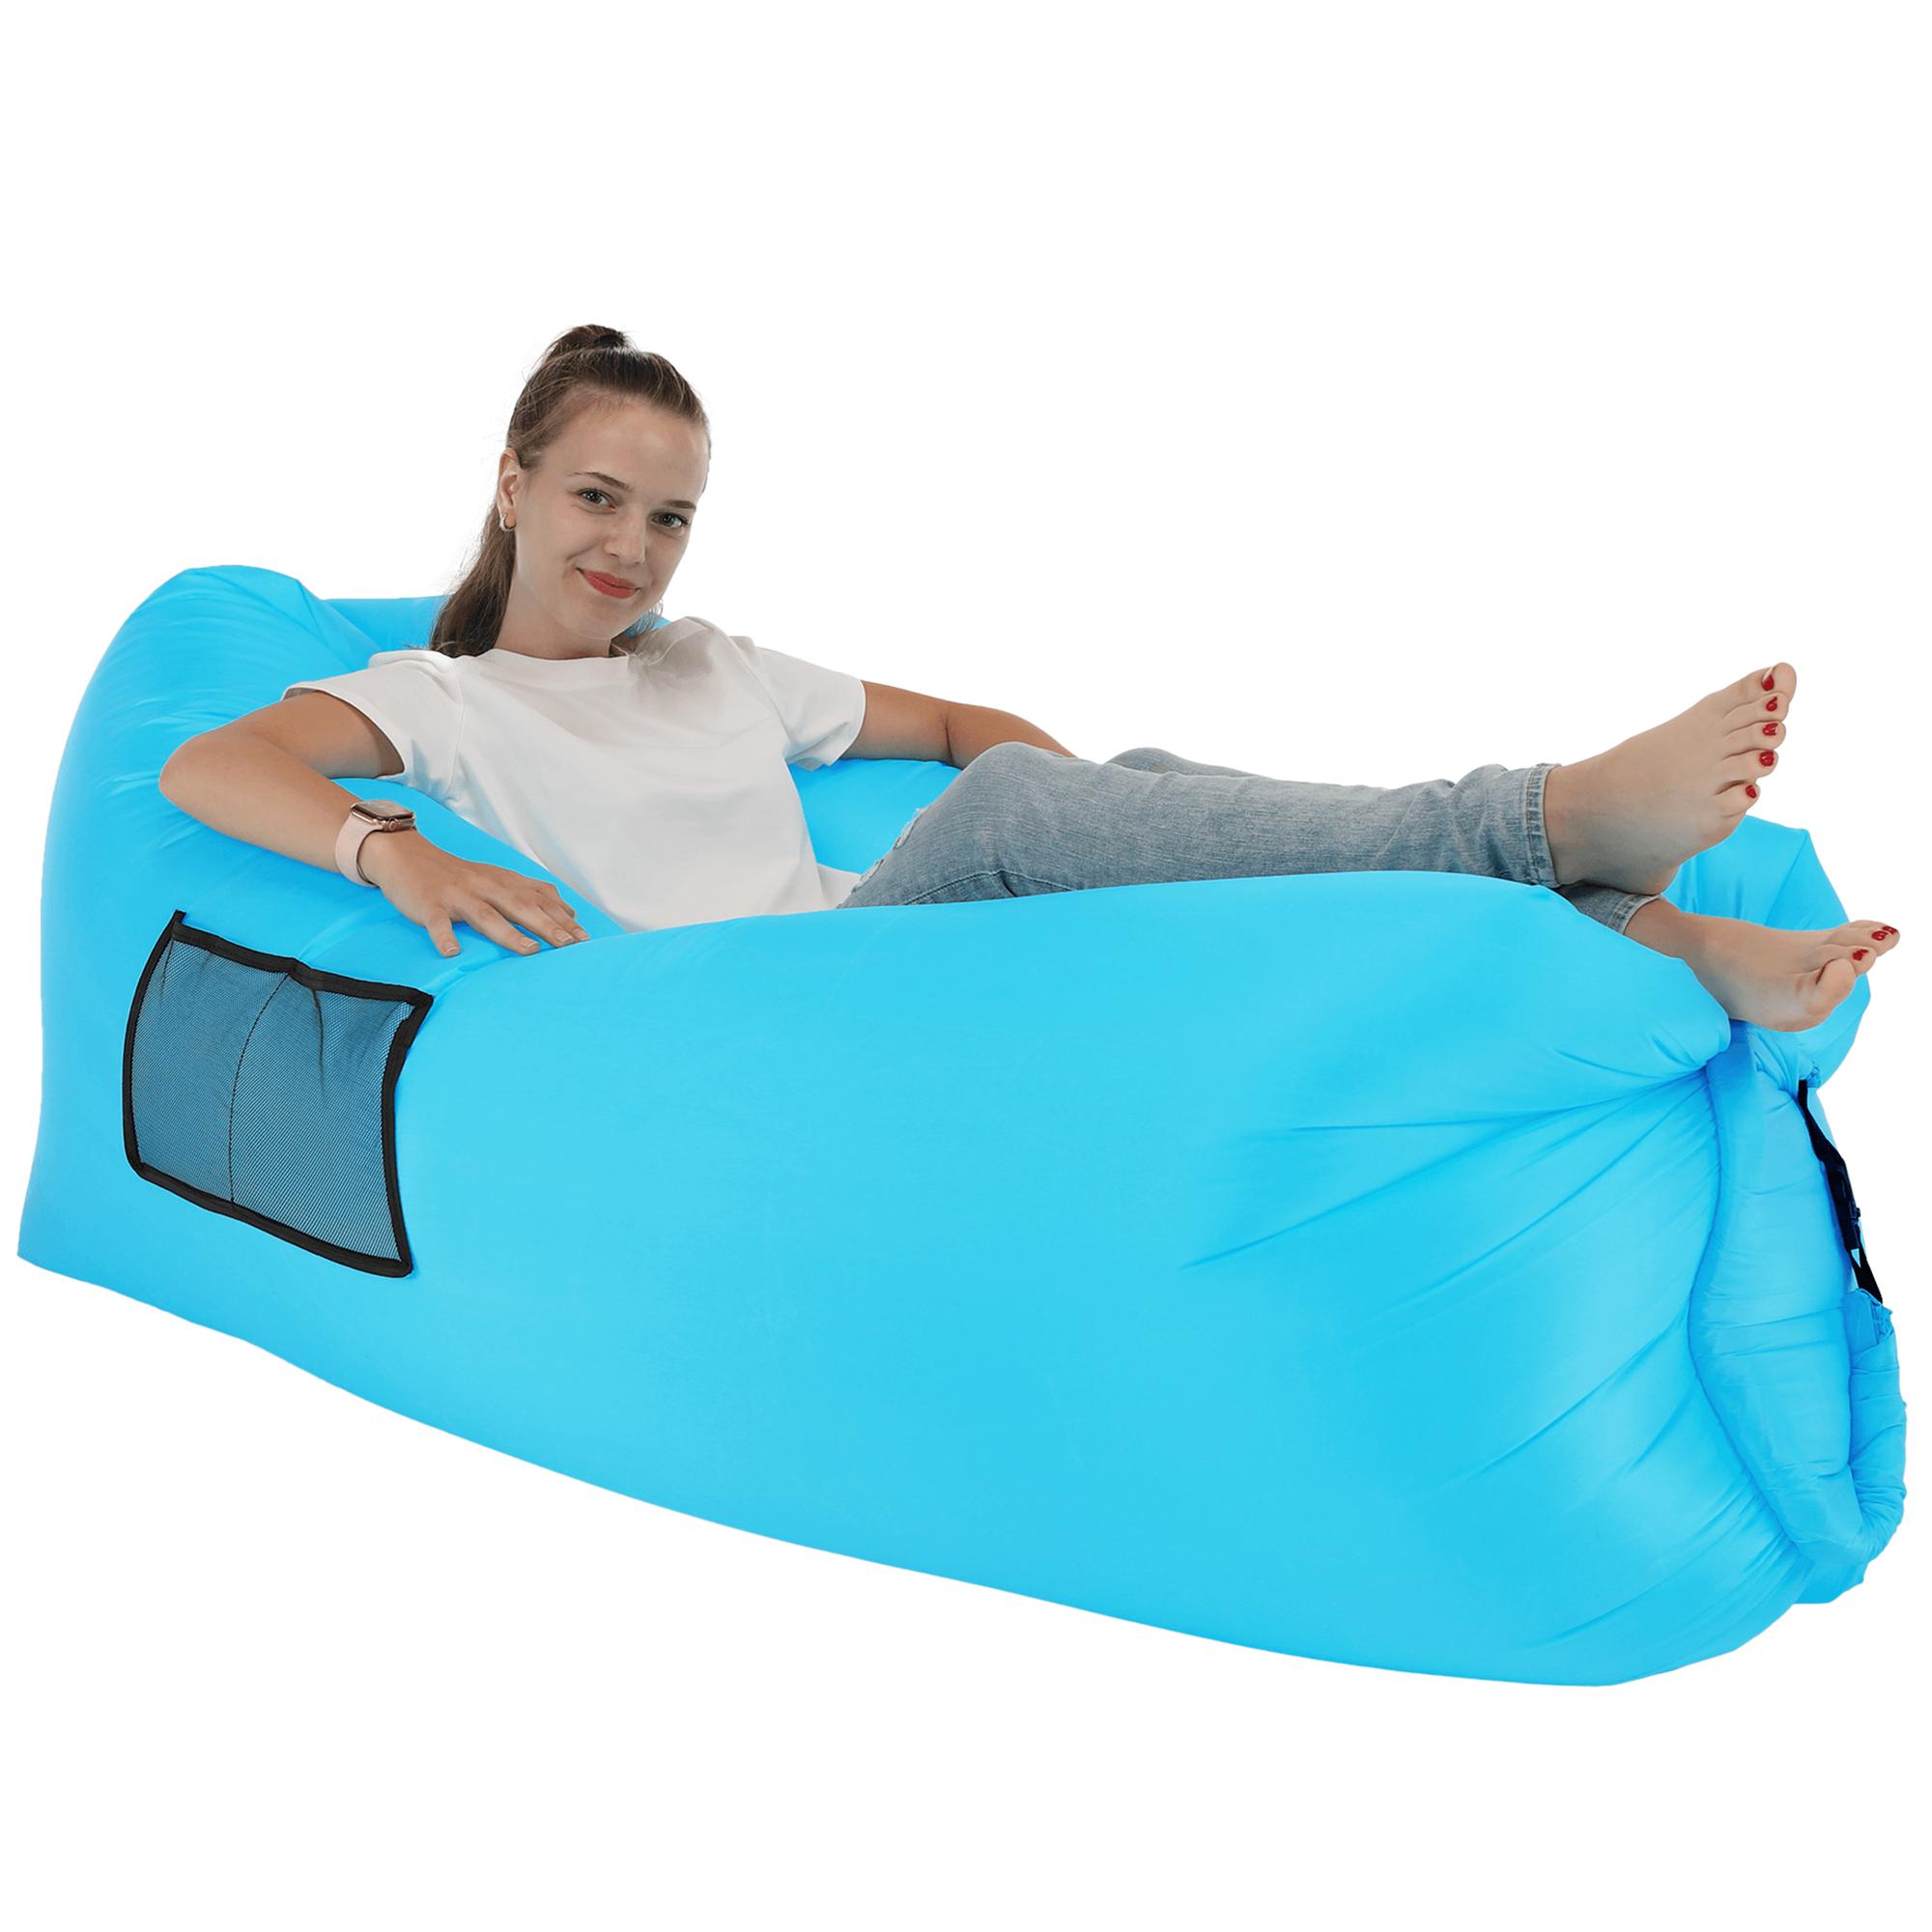 Nafukovací sedací vak/lazy bag, modrá, LEBAG